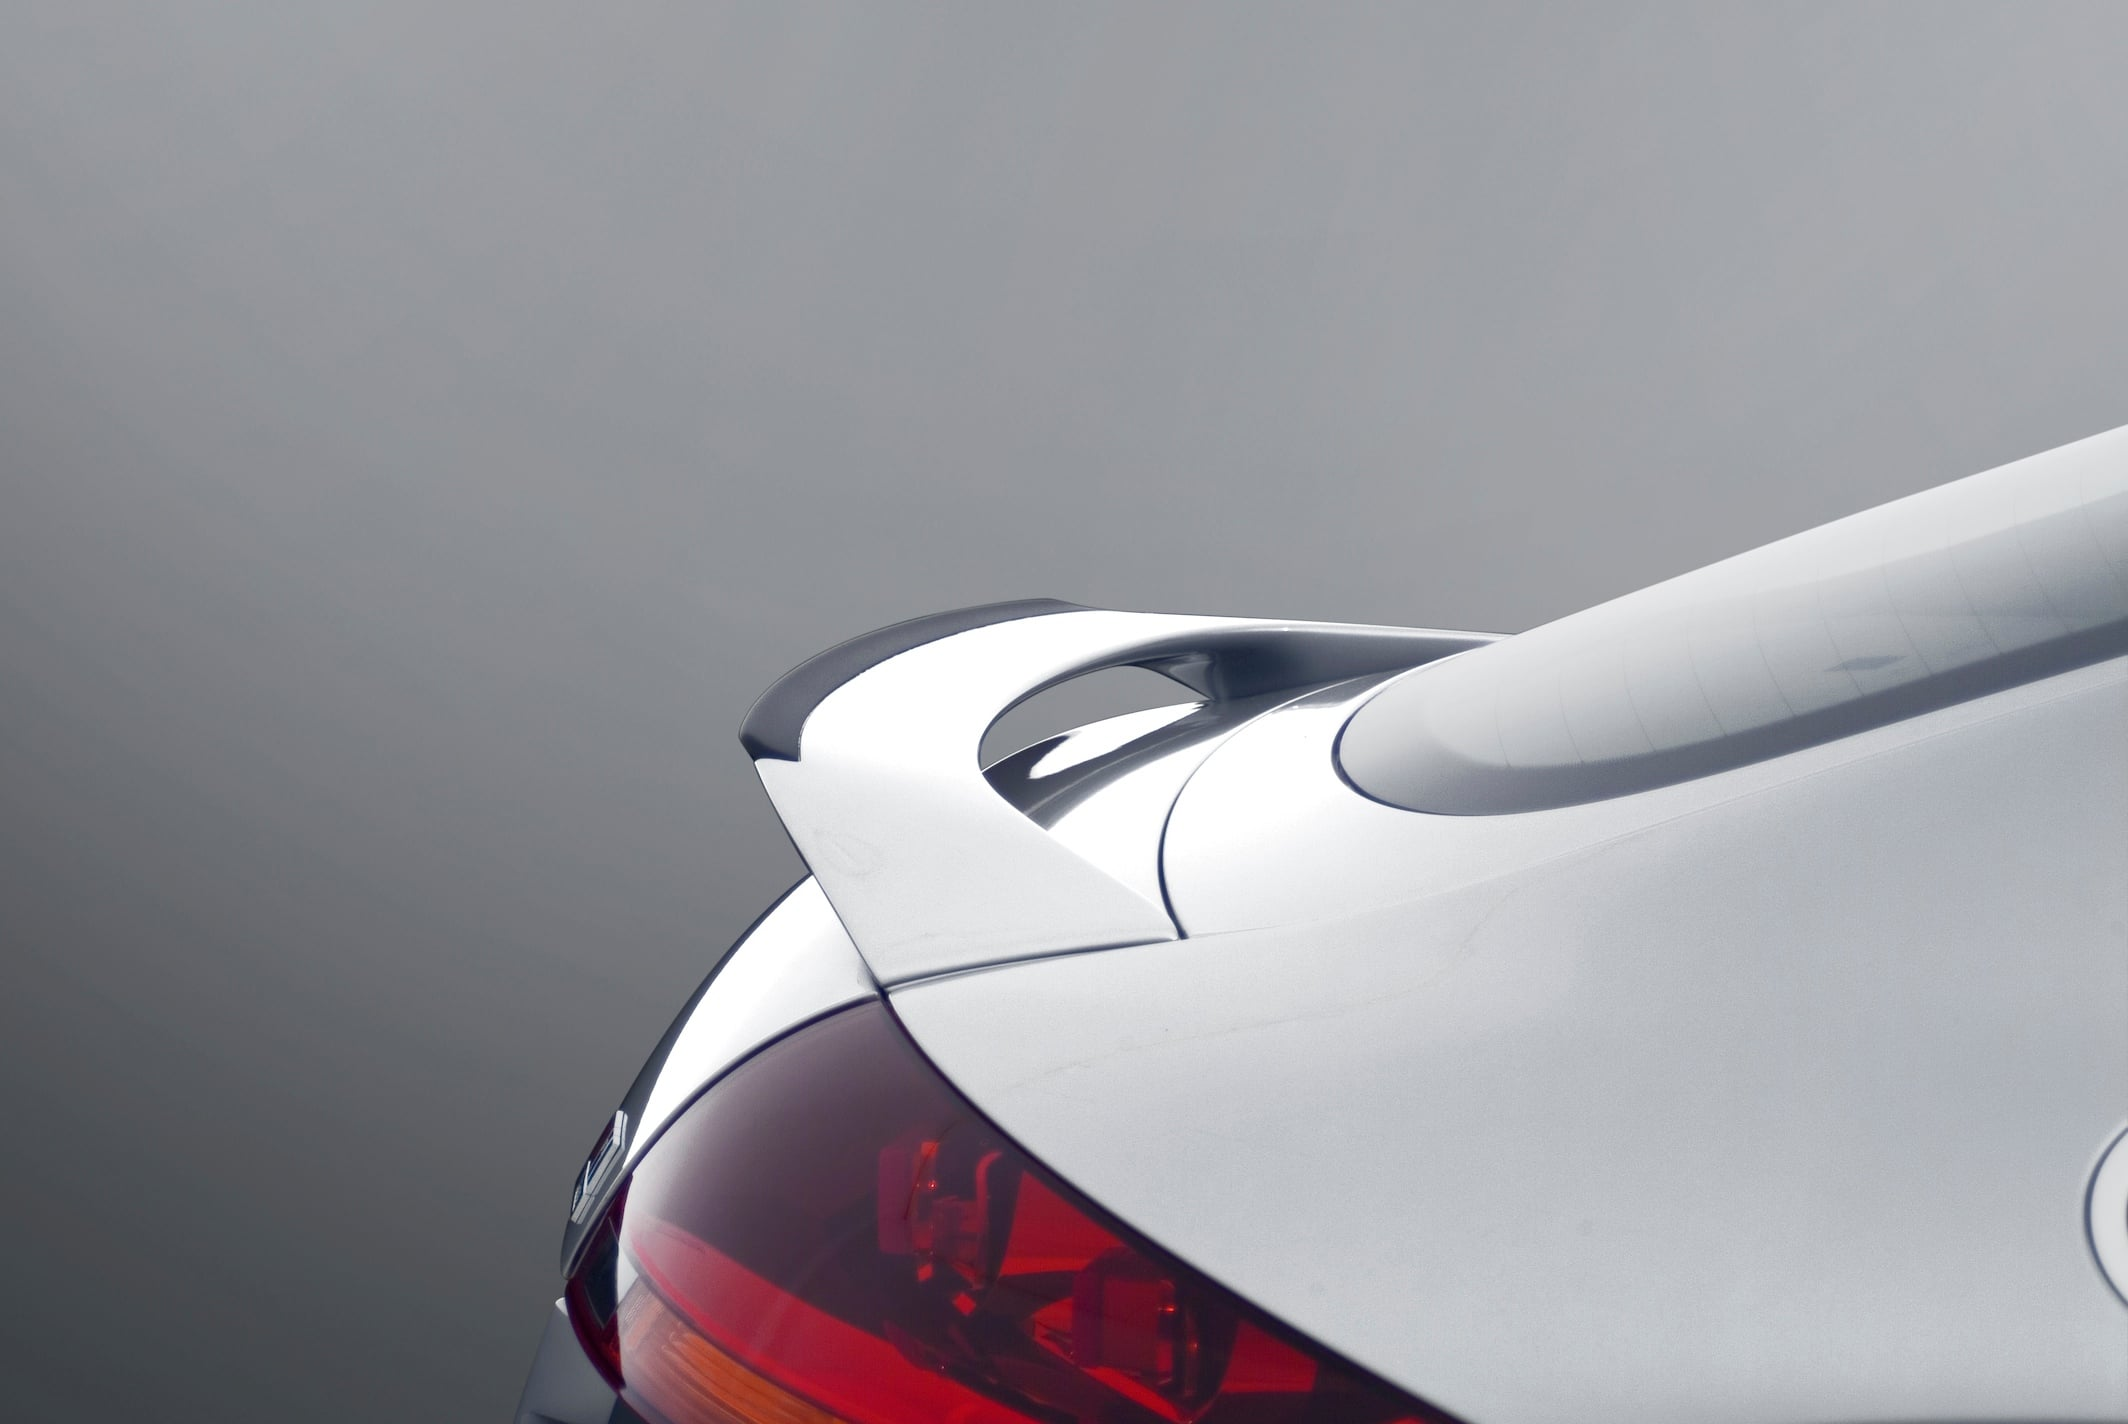 Caractere Trunk Spoiler, fits Audi TT Mk2 Coupe